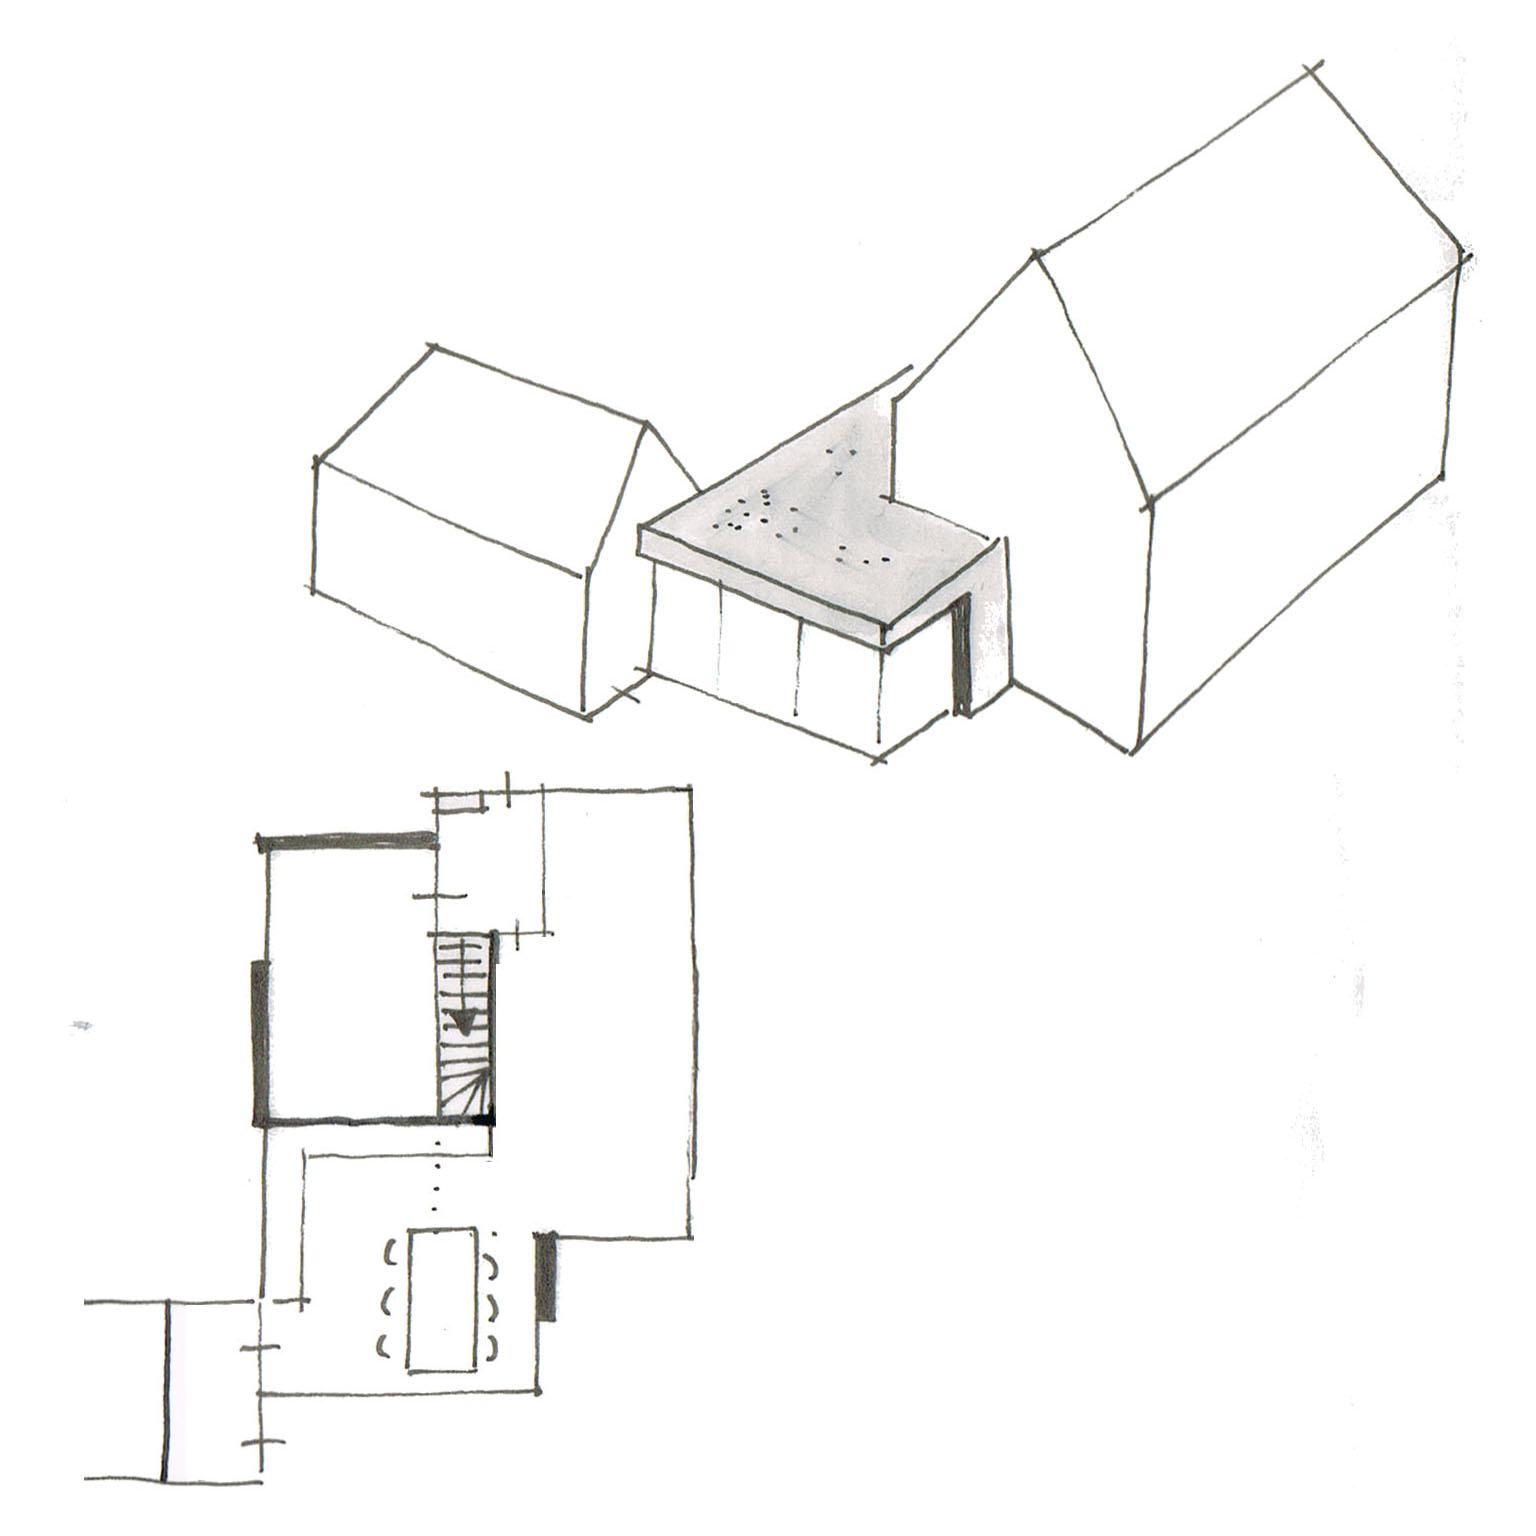 stoel_architect_kampen_stoelaantafel (3)